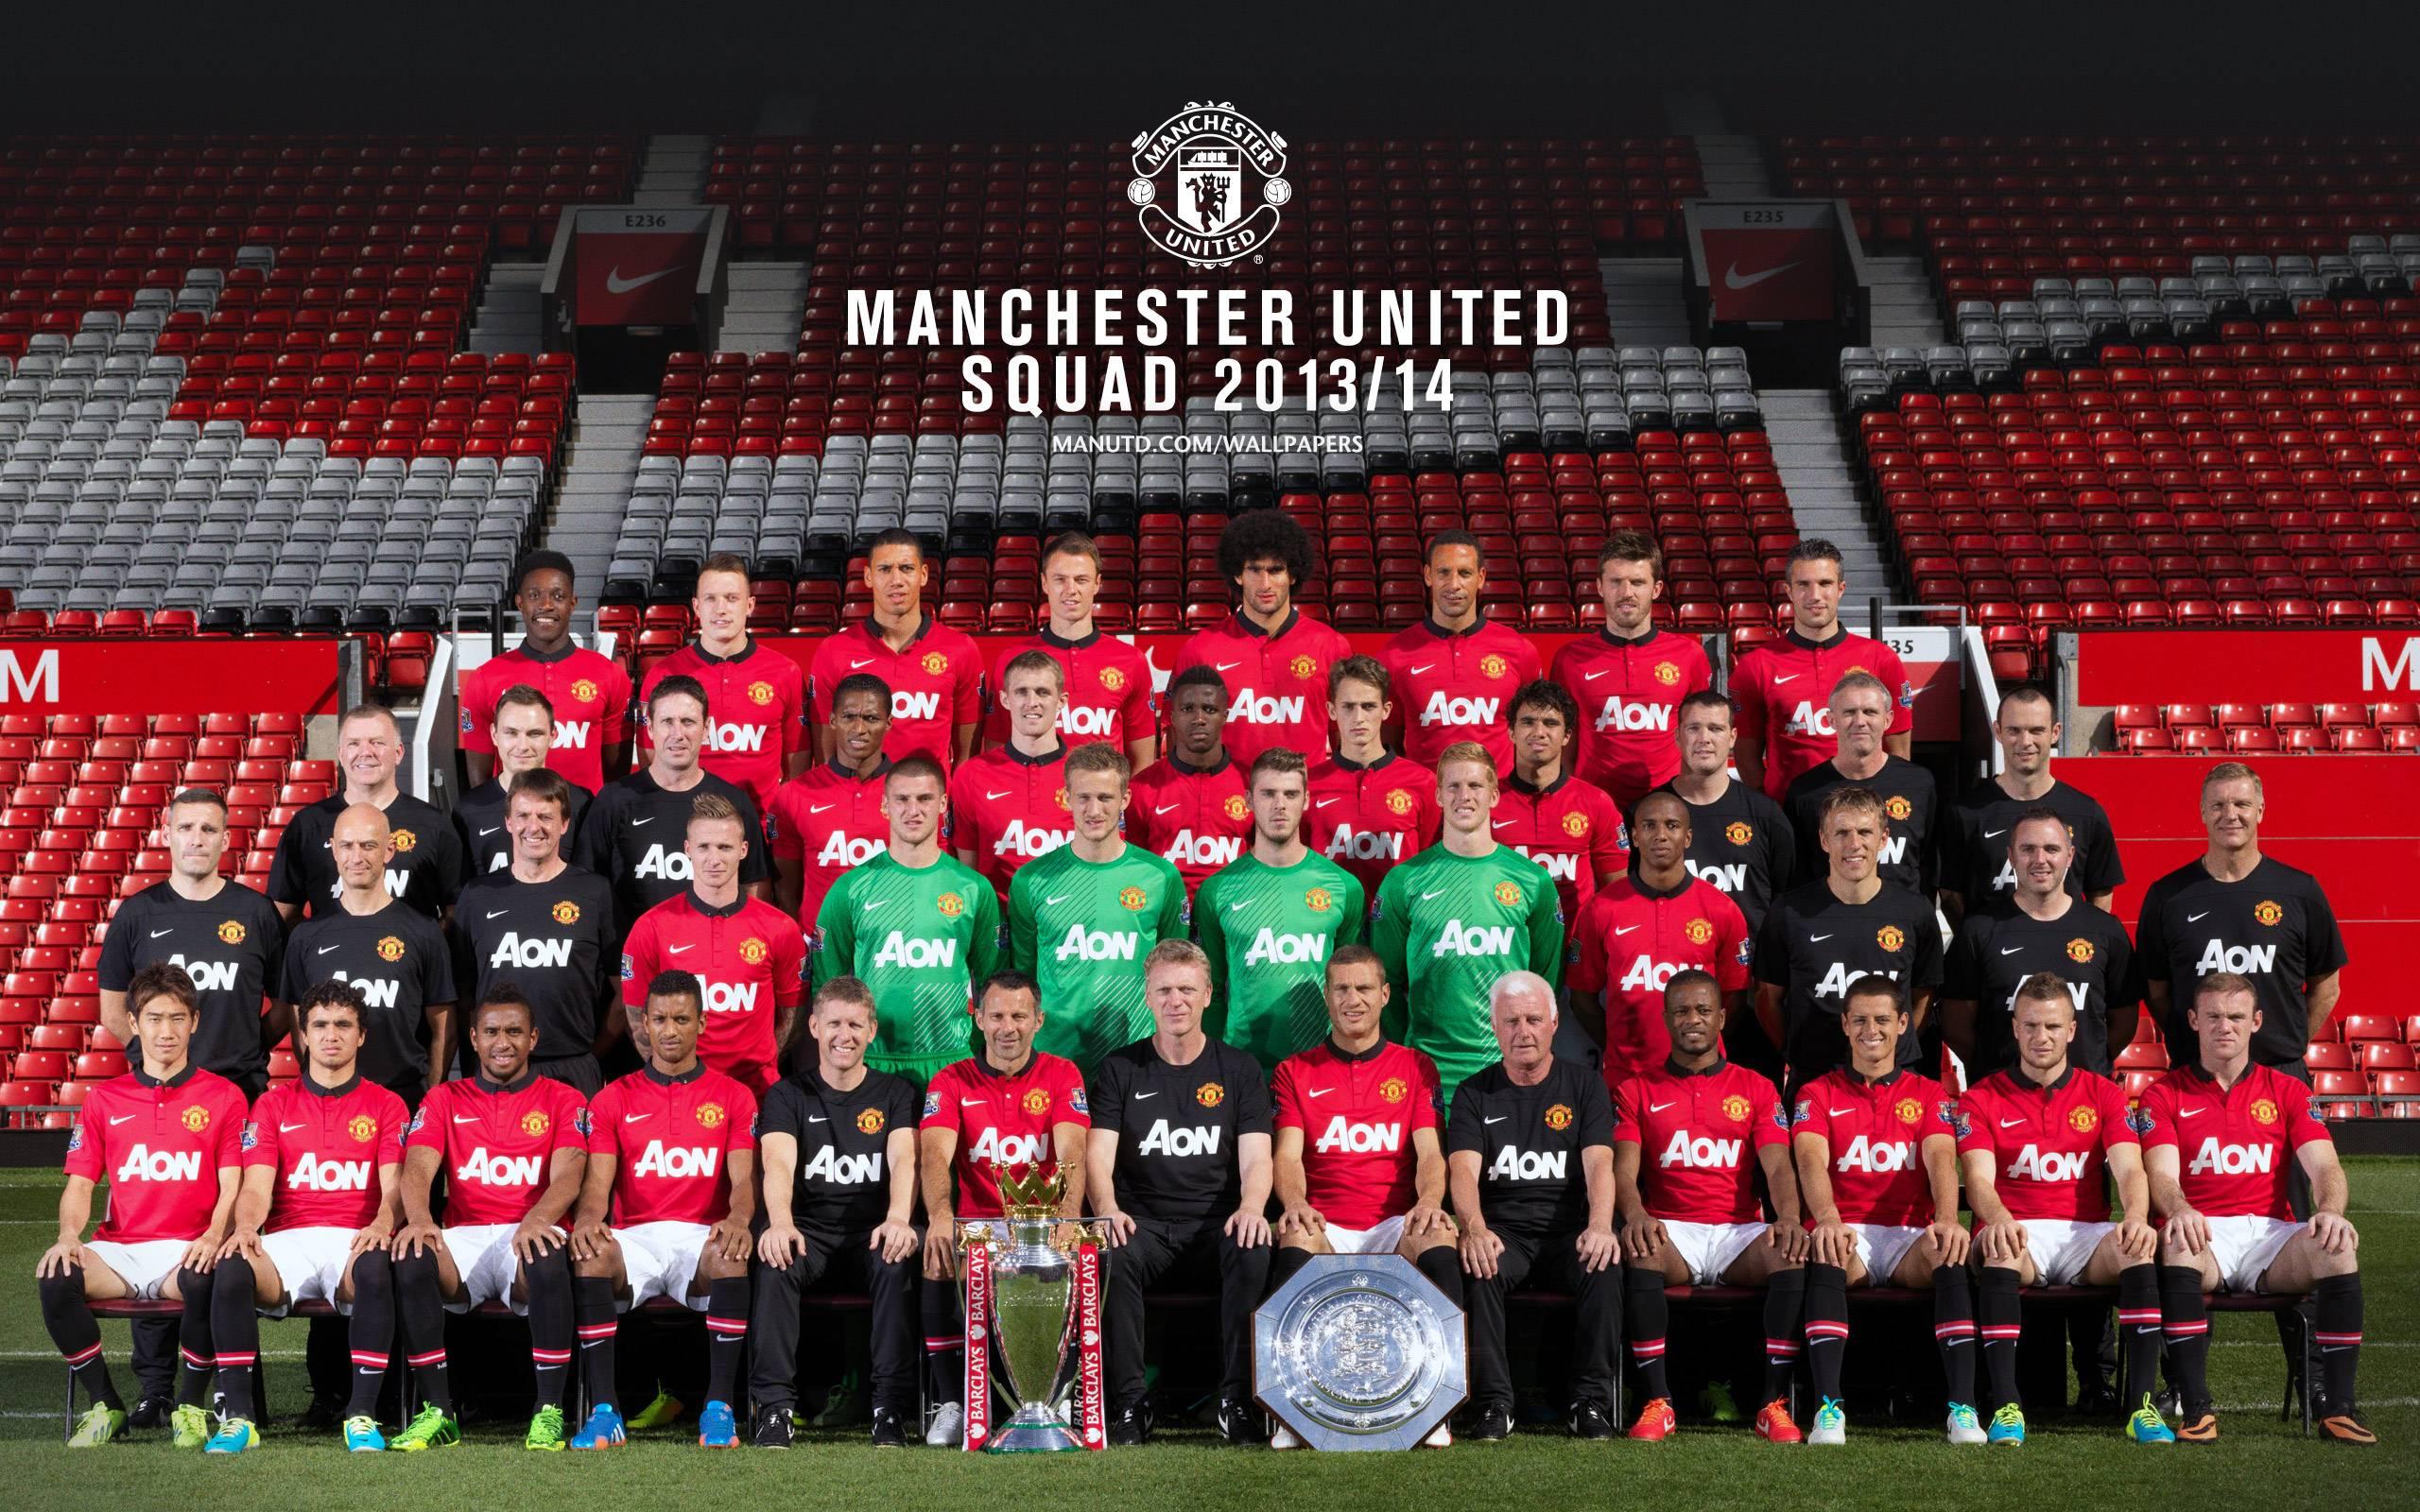 50 ] Manchester United Wallpaper Hd 2015 On WallpaperSafari